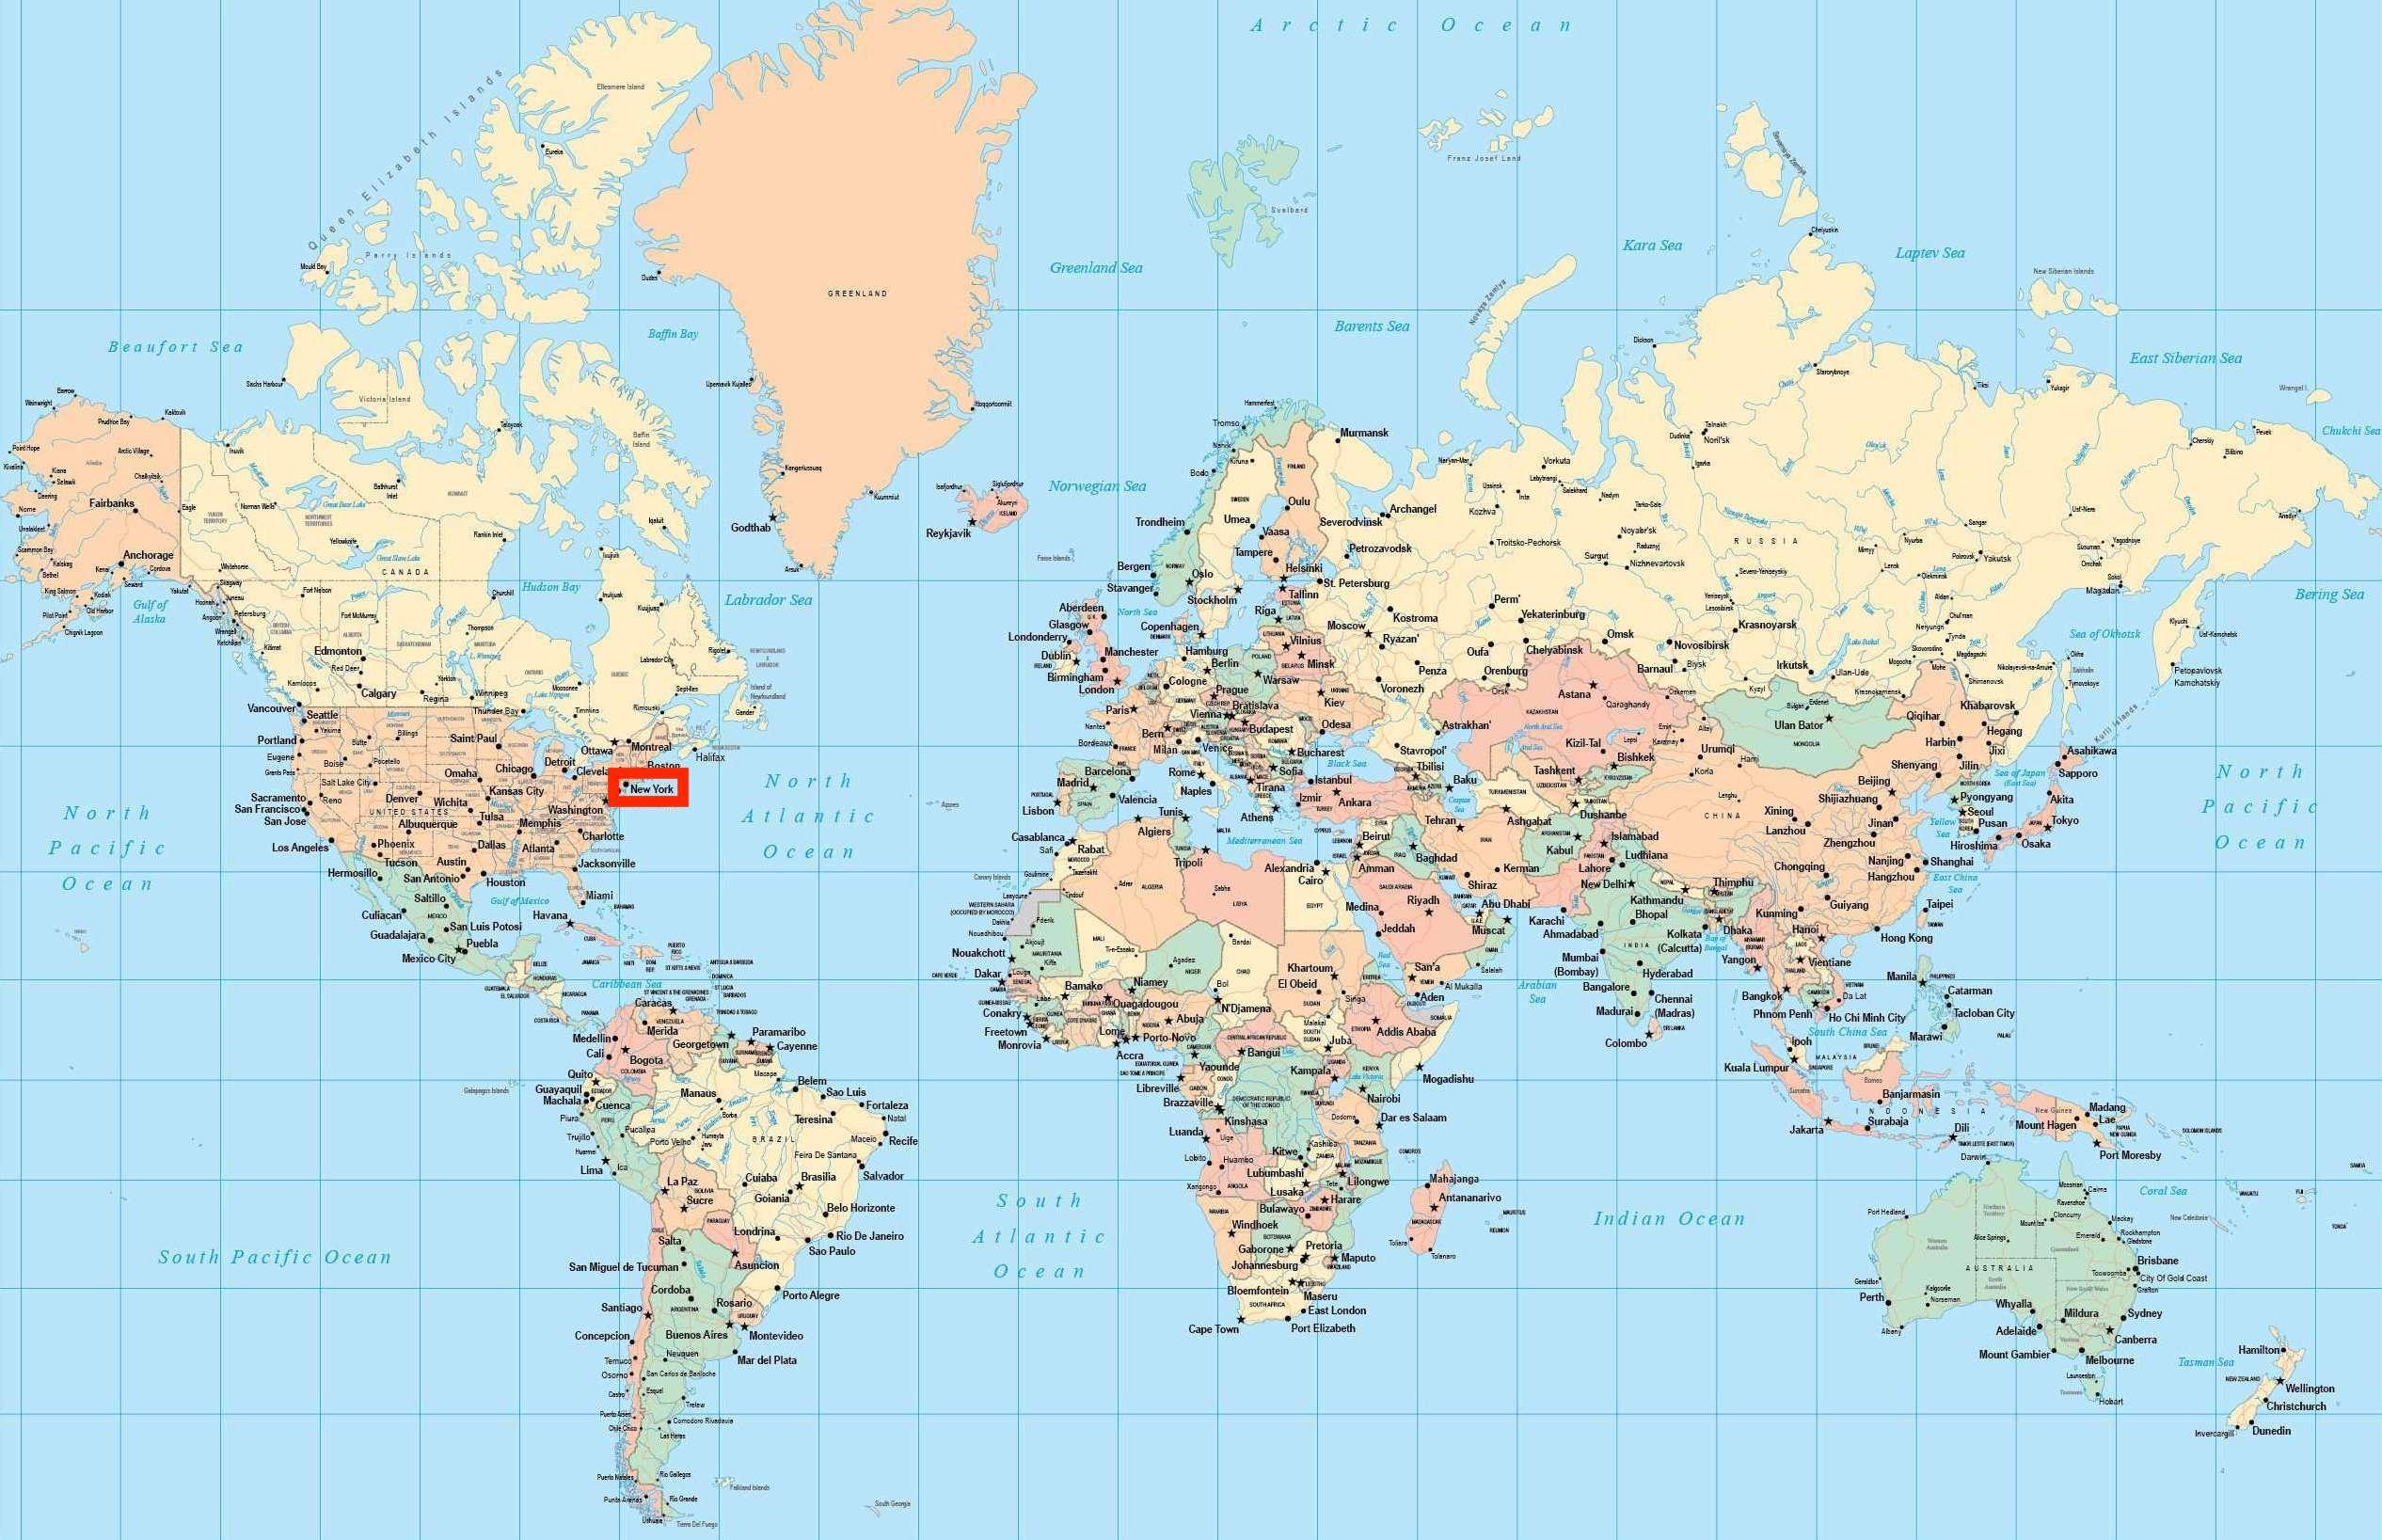 New York On World Map World Map Showing New York New York Usa